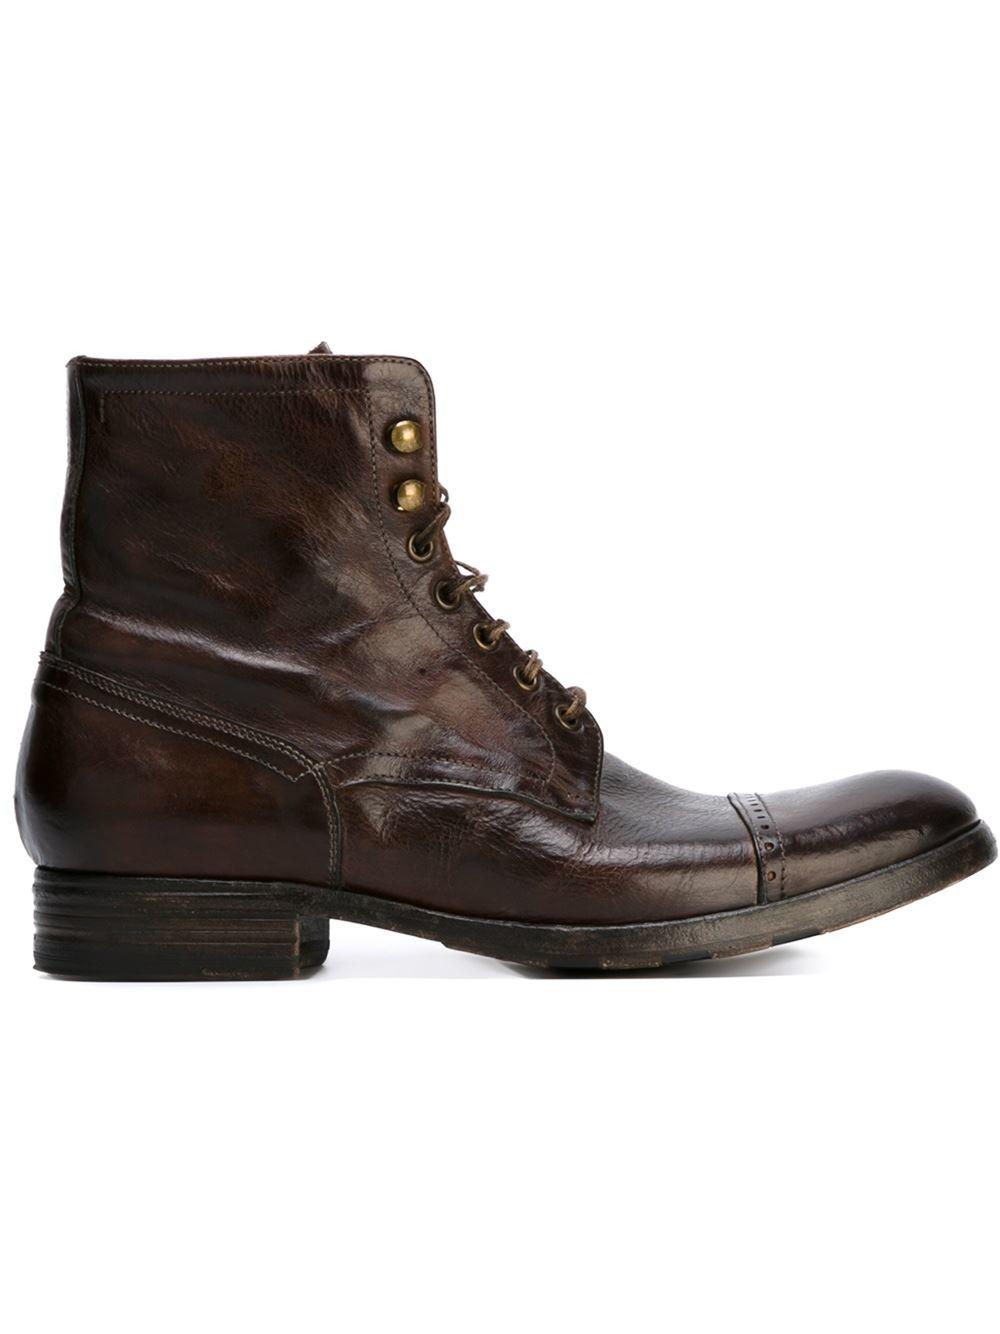 pete sorensen detroit combat boots in brown for lyst